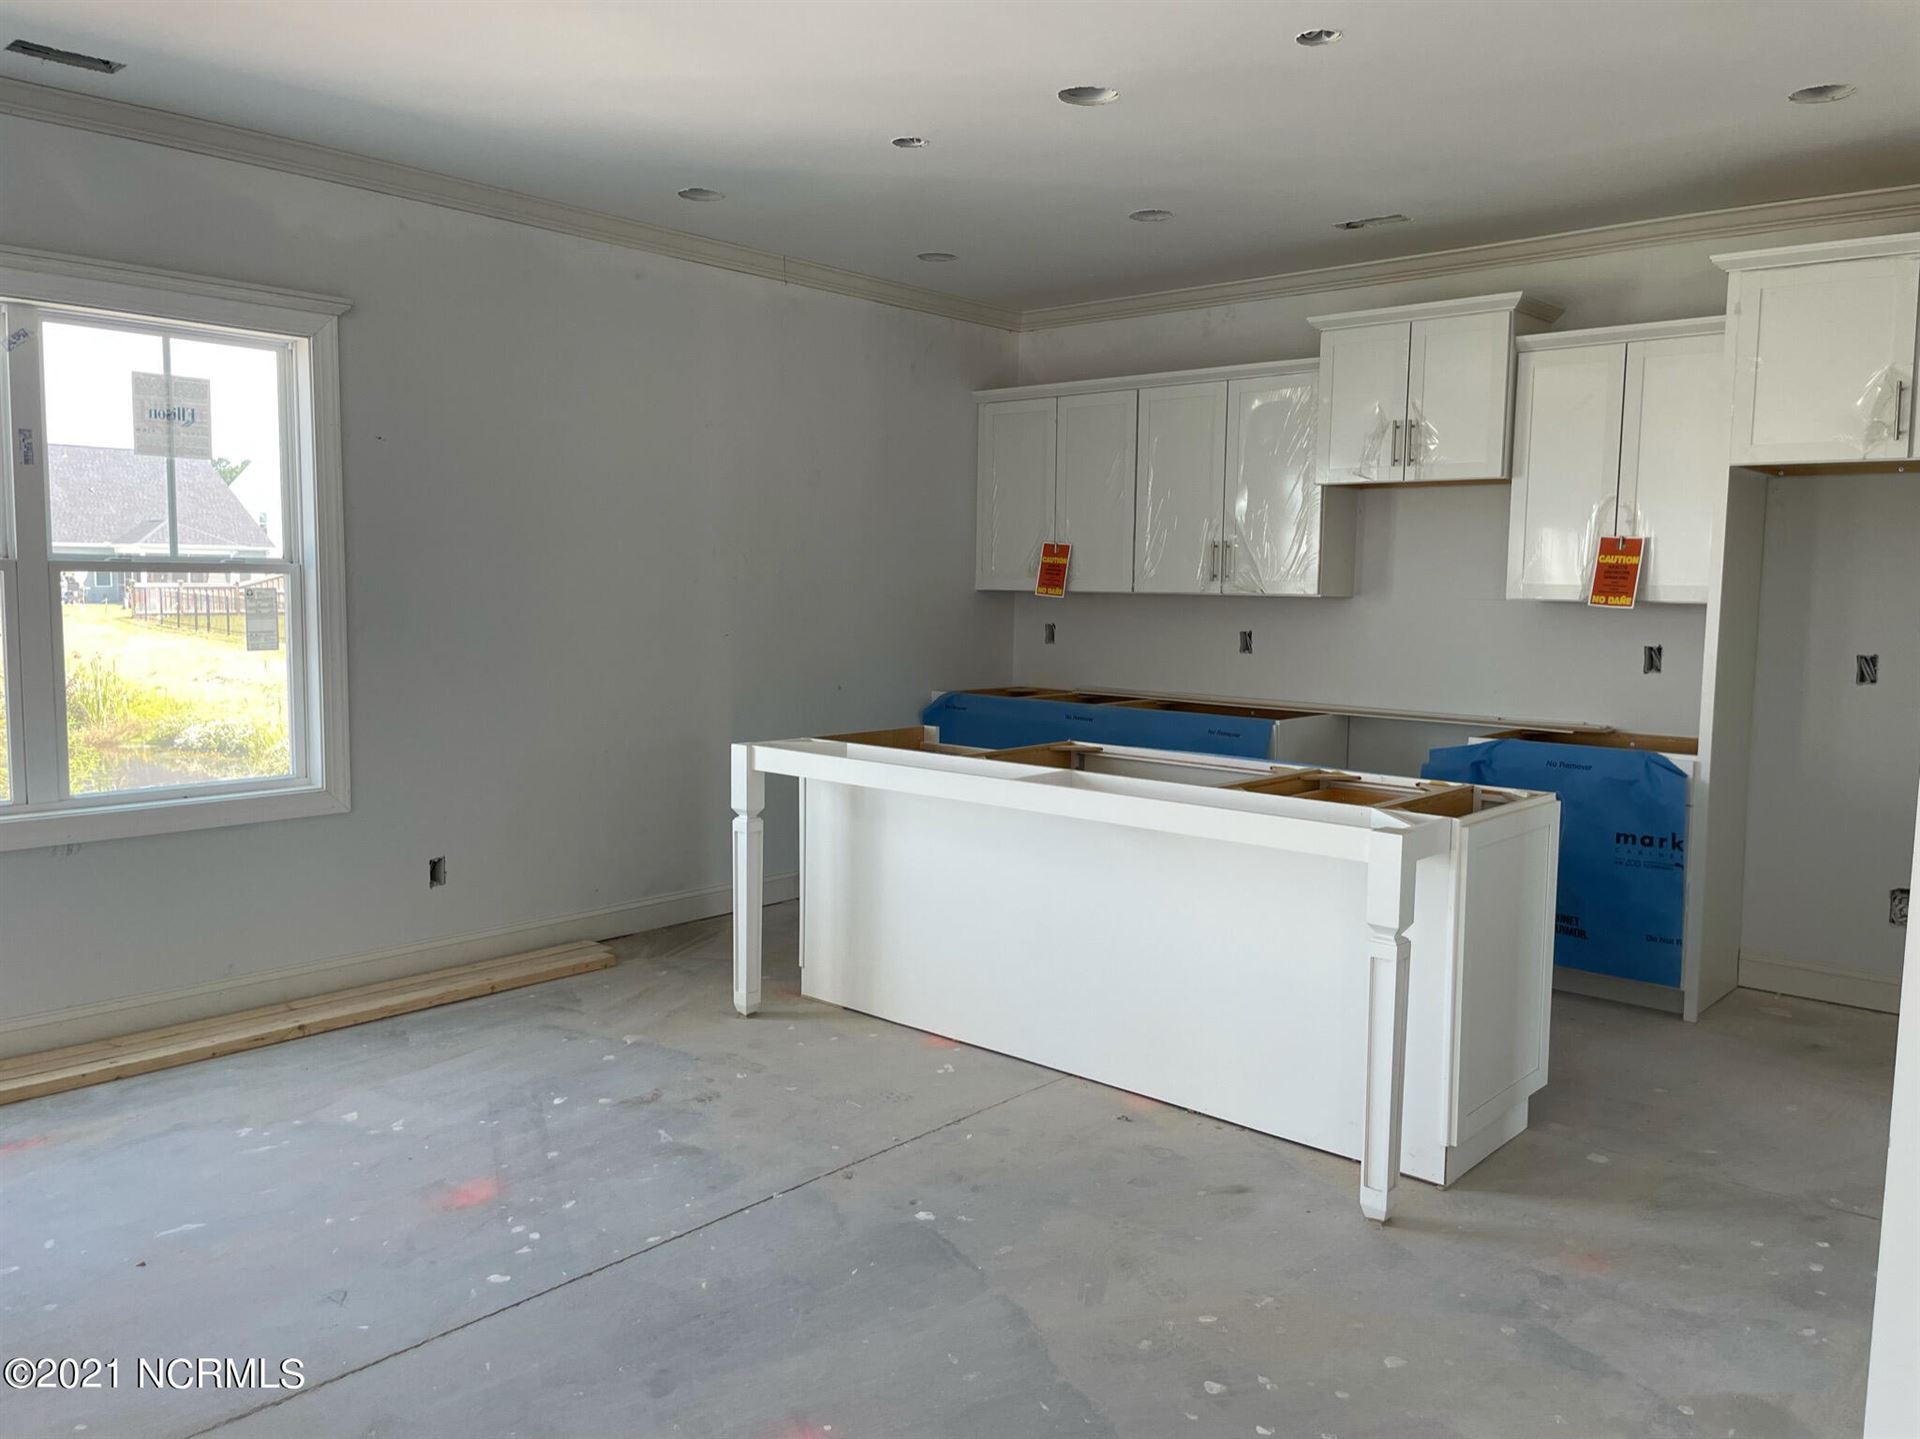 Photo of 5961 Appomattox Drive, Wilmington, NC 28409 (MLS # 100283080)